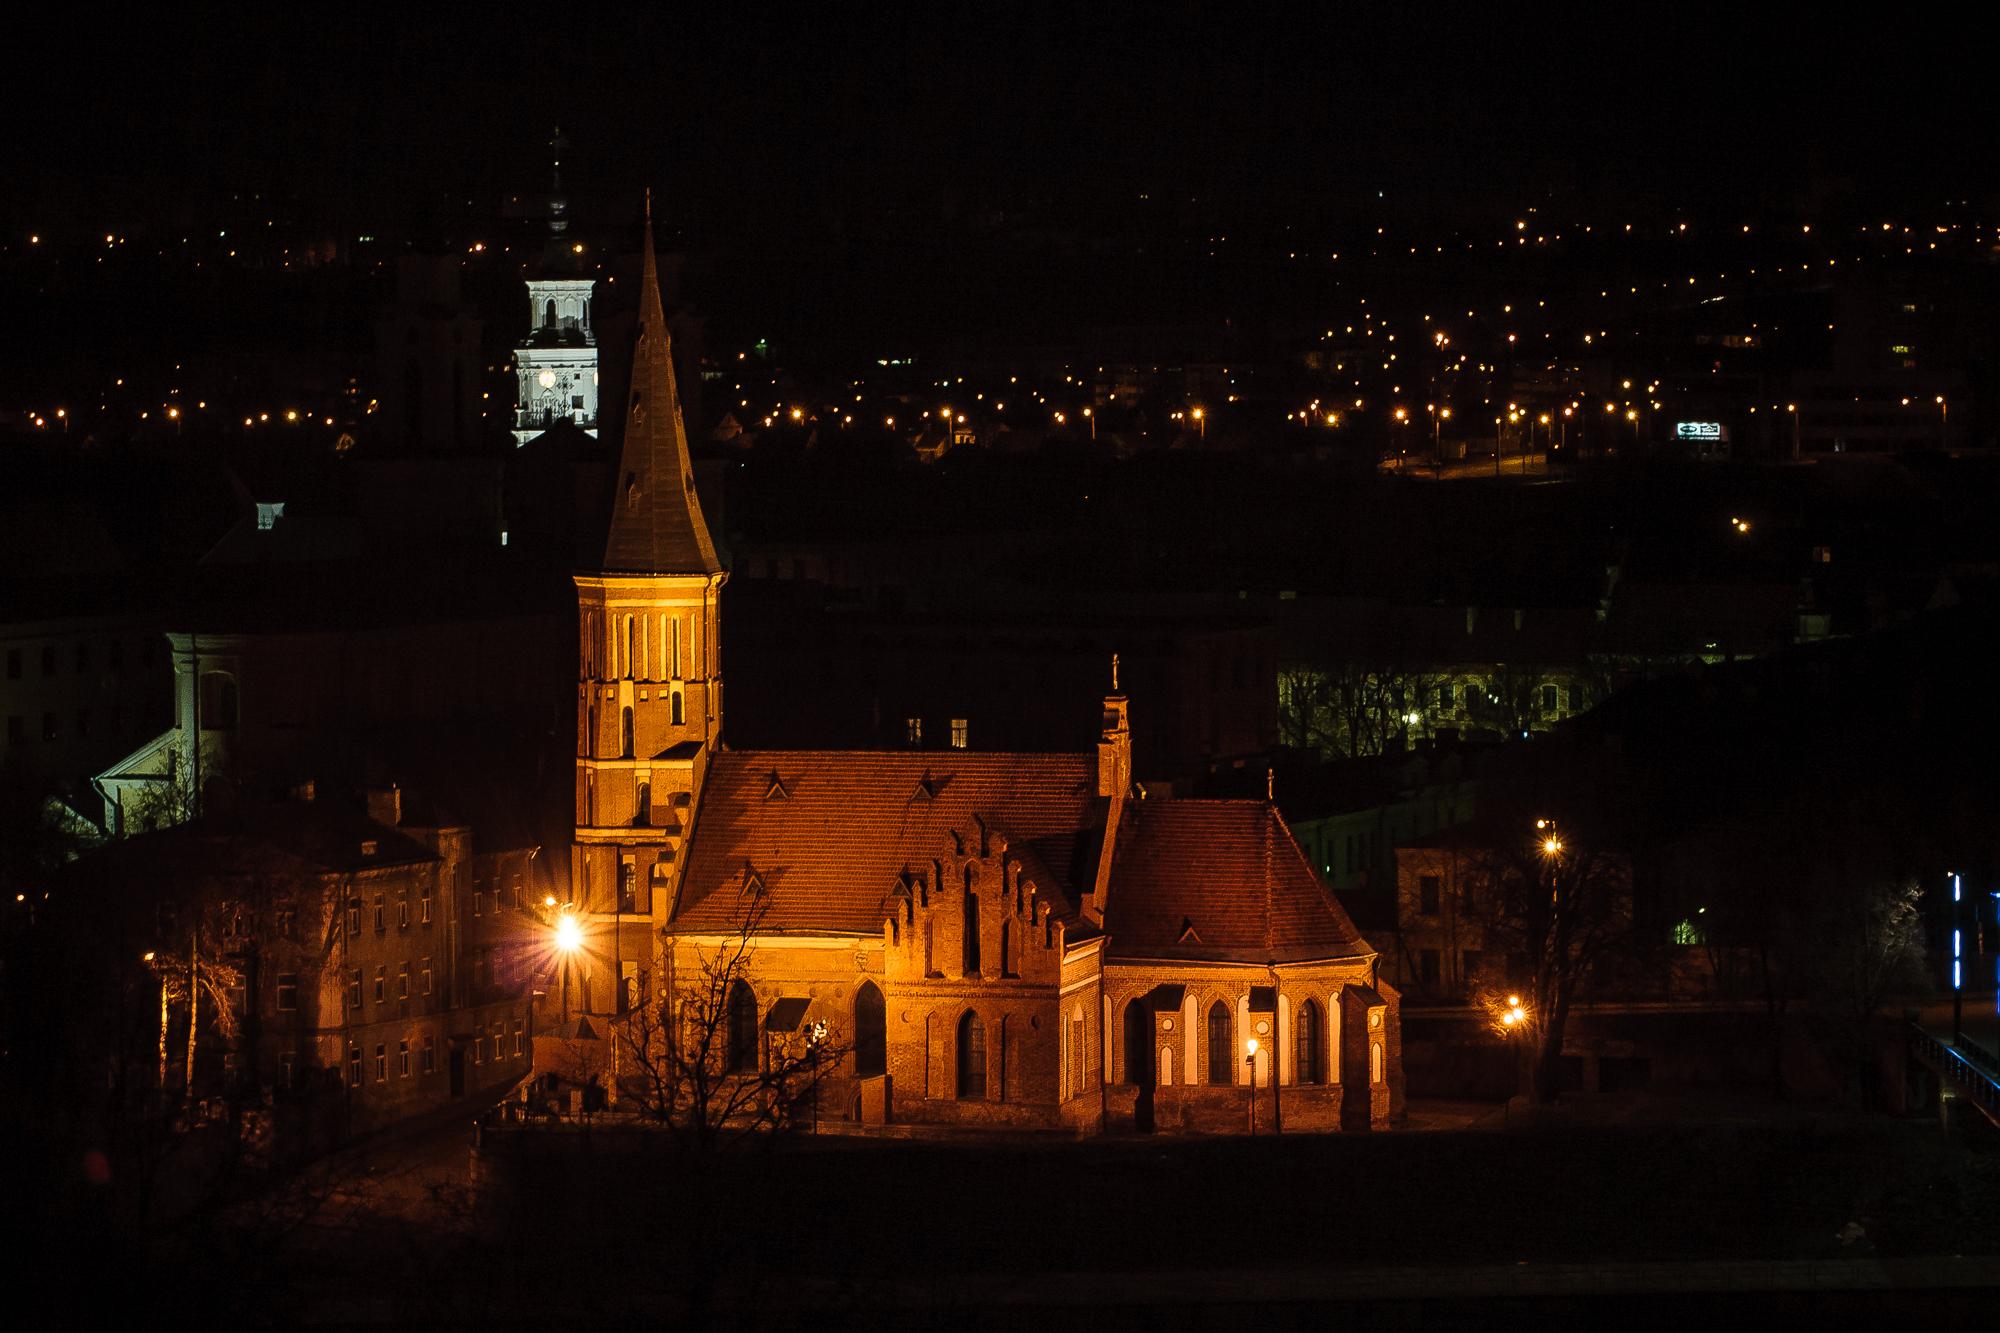 Vytautas Church Via @Atisgailis